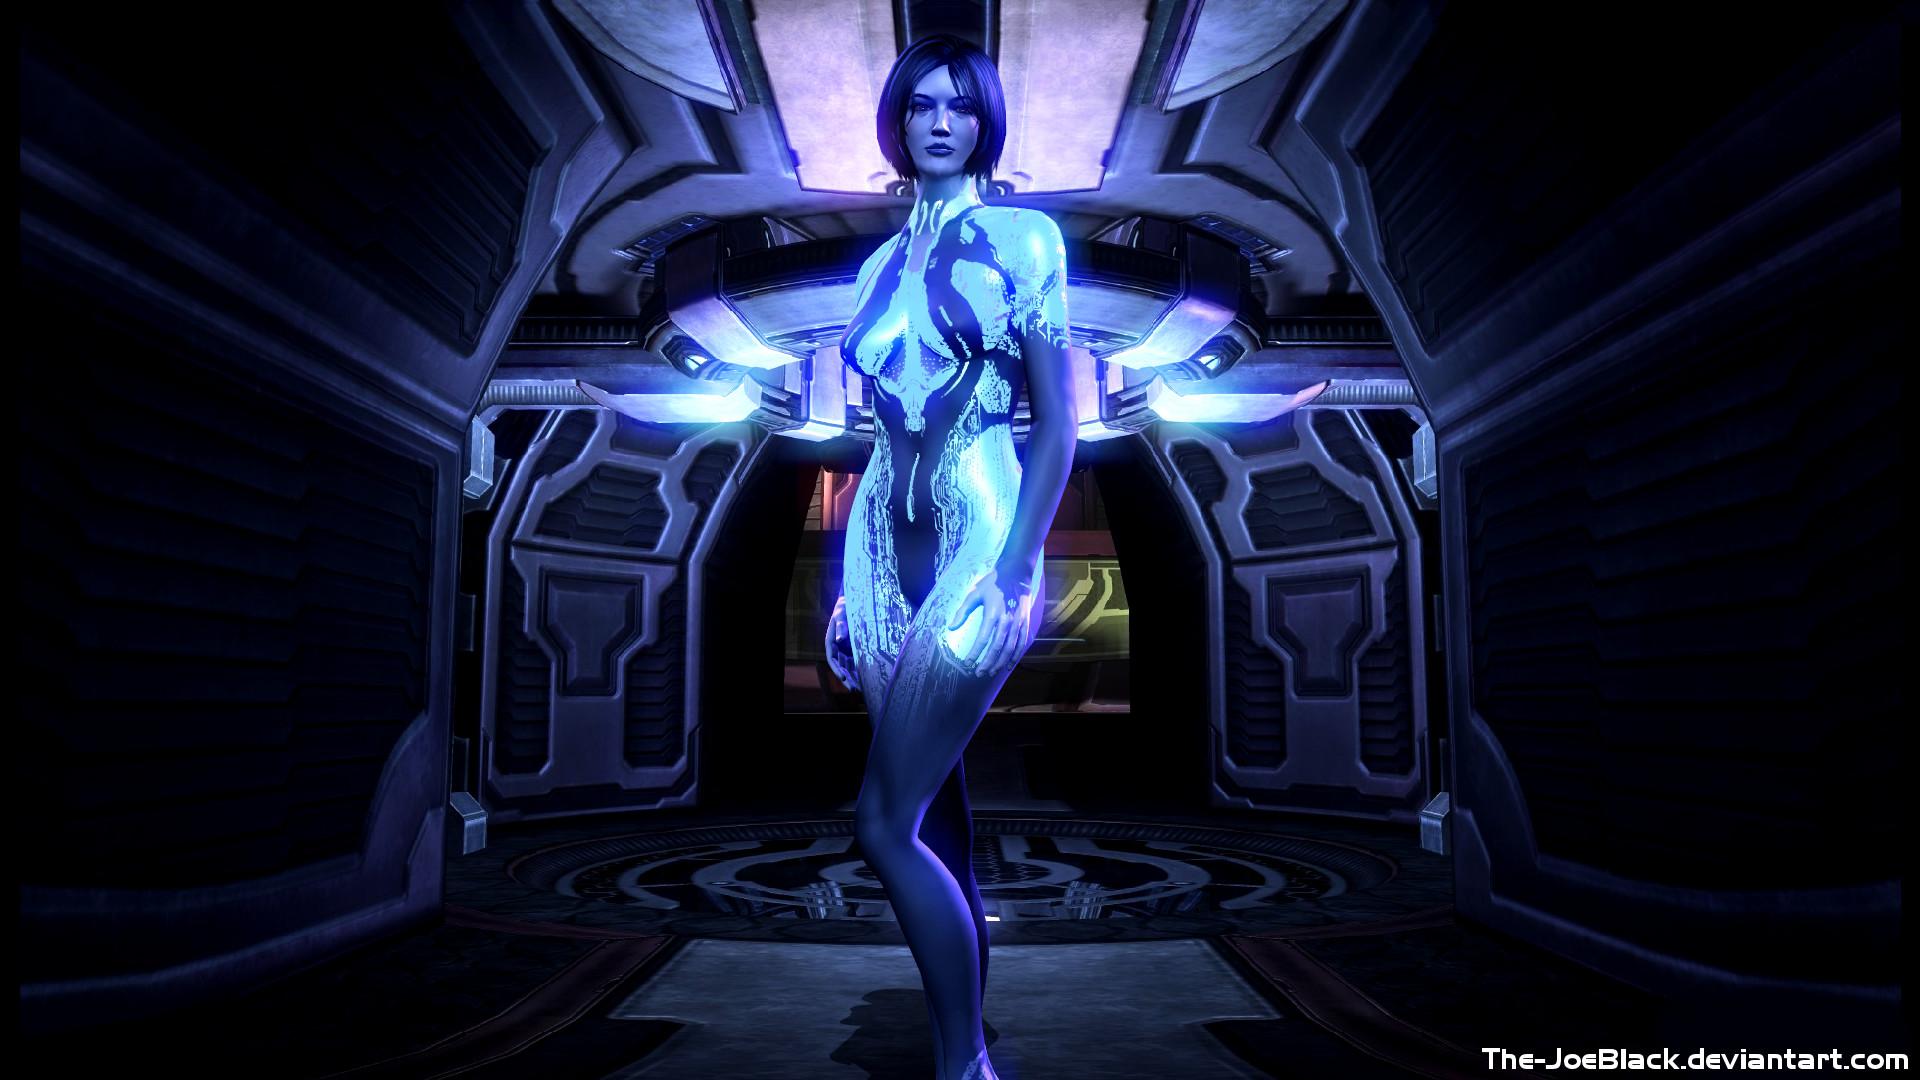 Halo 4 Cortana Wallpaper By Shaunsarthouse On Deviantart